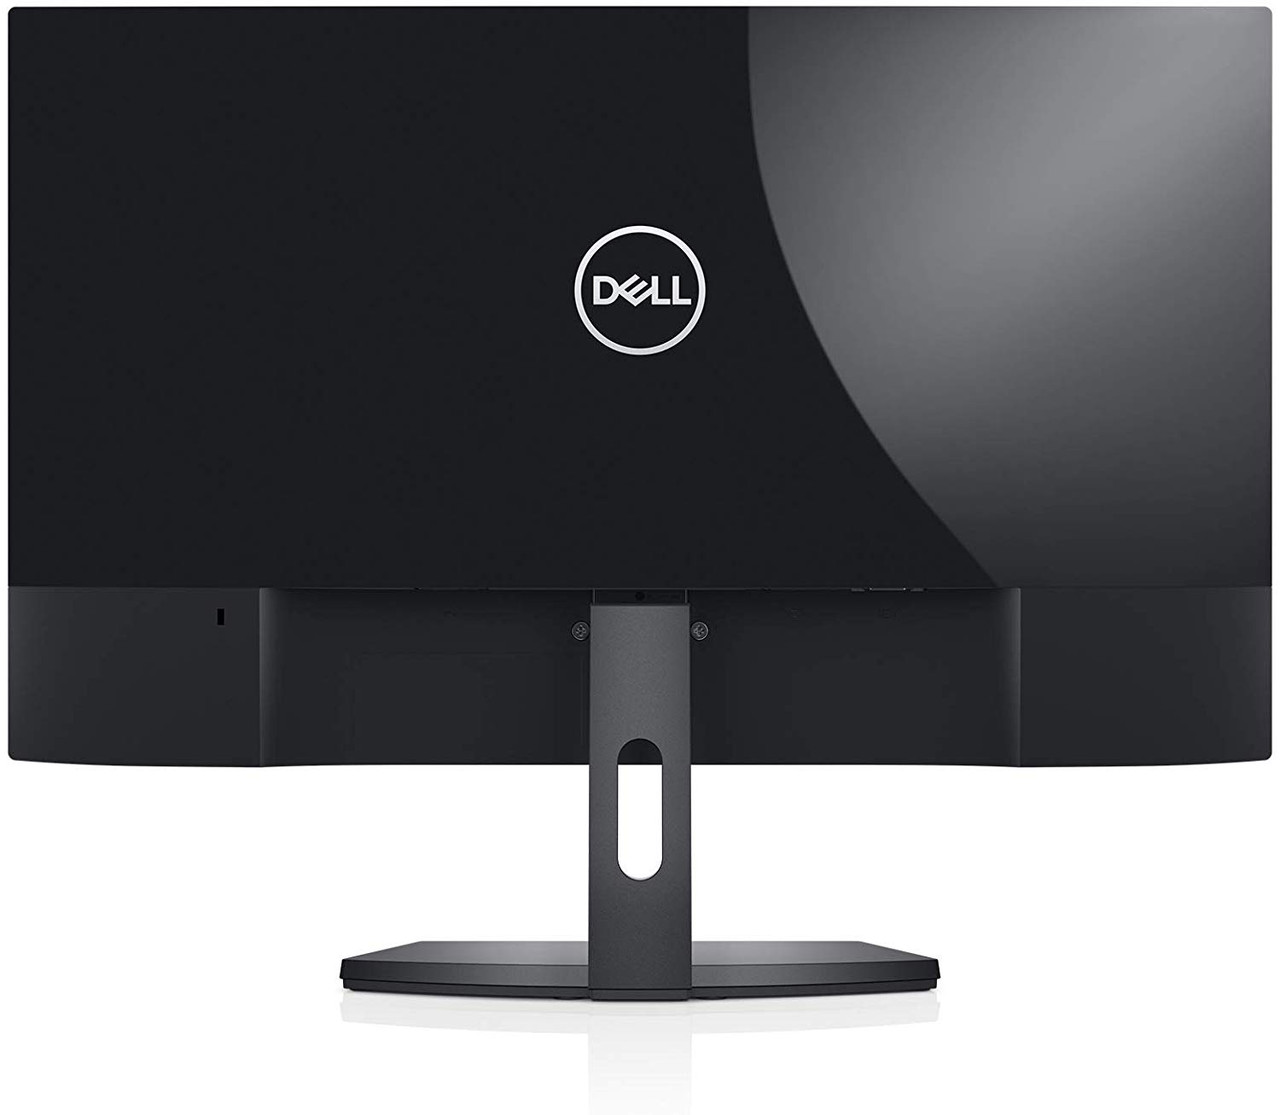 Dell SE2419H 24 LED LCD Monitor